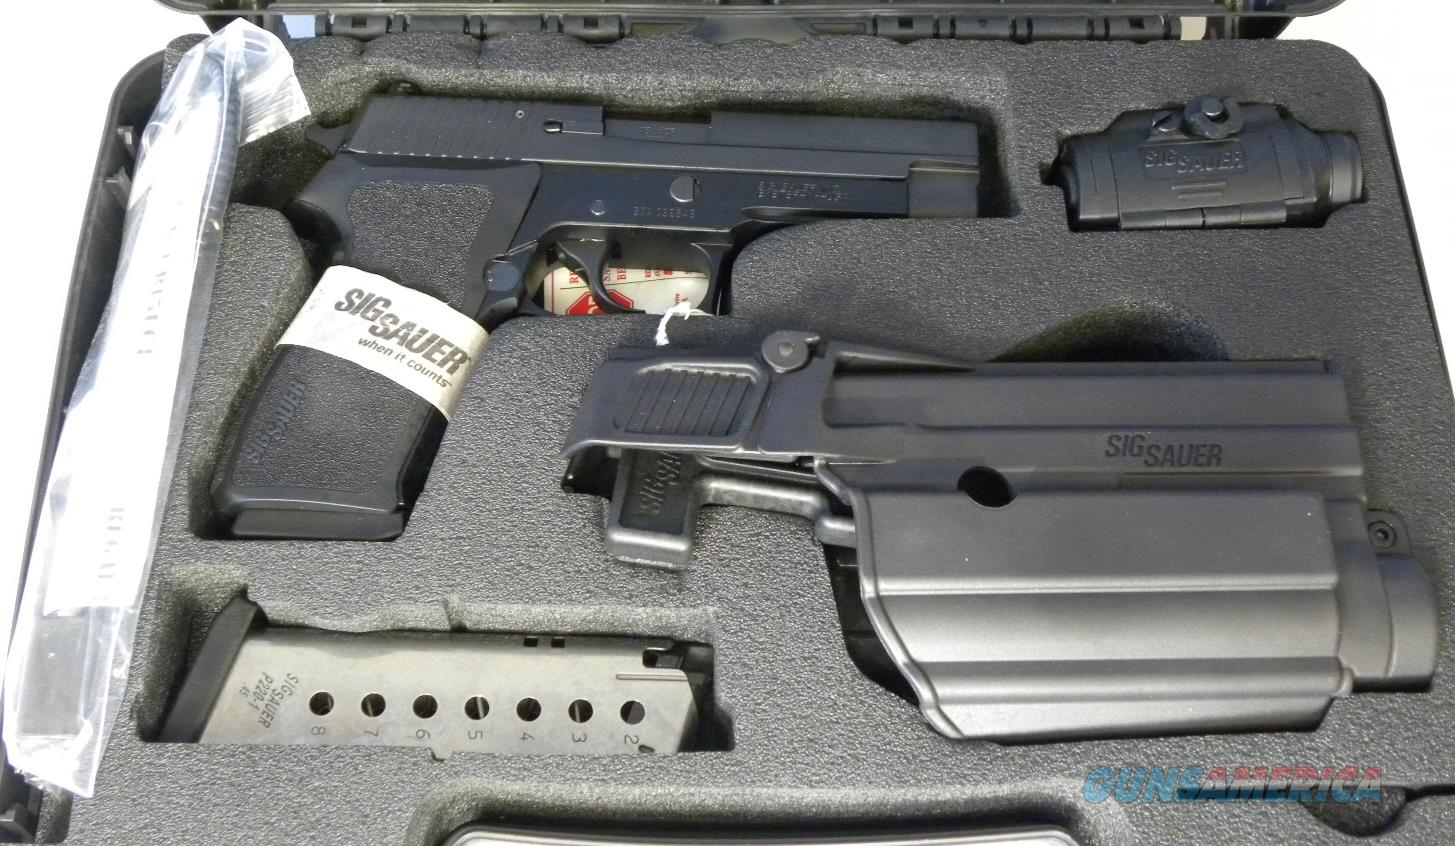 Sig Sauer 220R-45-BSS-TACPAC-LASER  Guns > Pistols > Sig - Sauer/Sigarms Pistols > P220